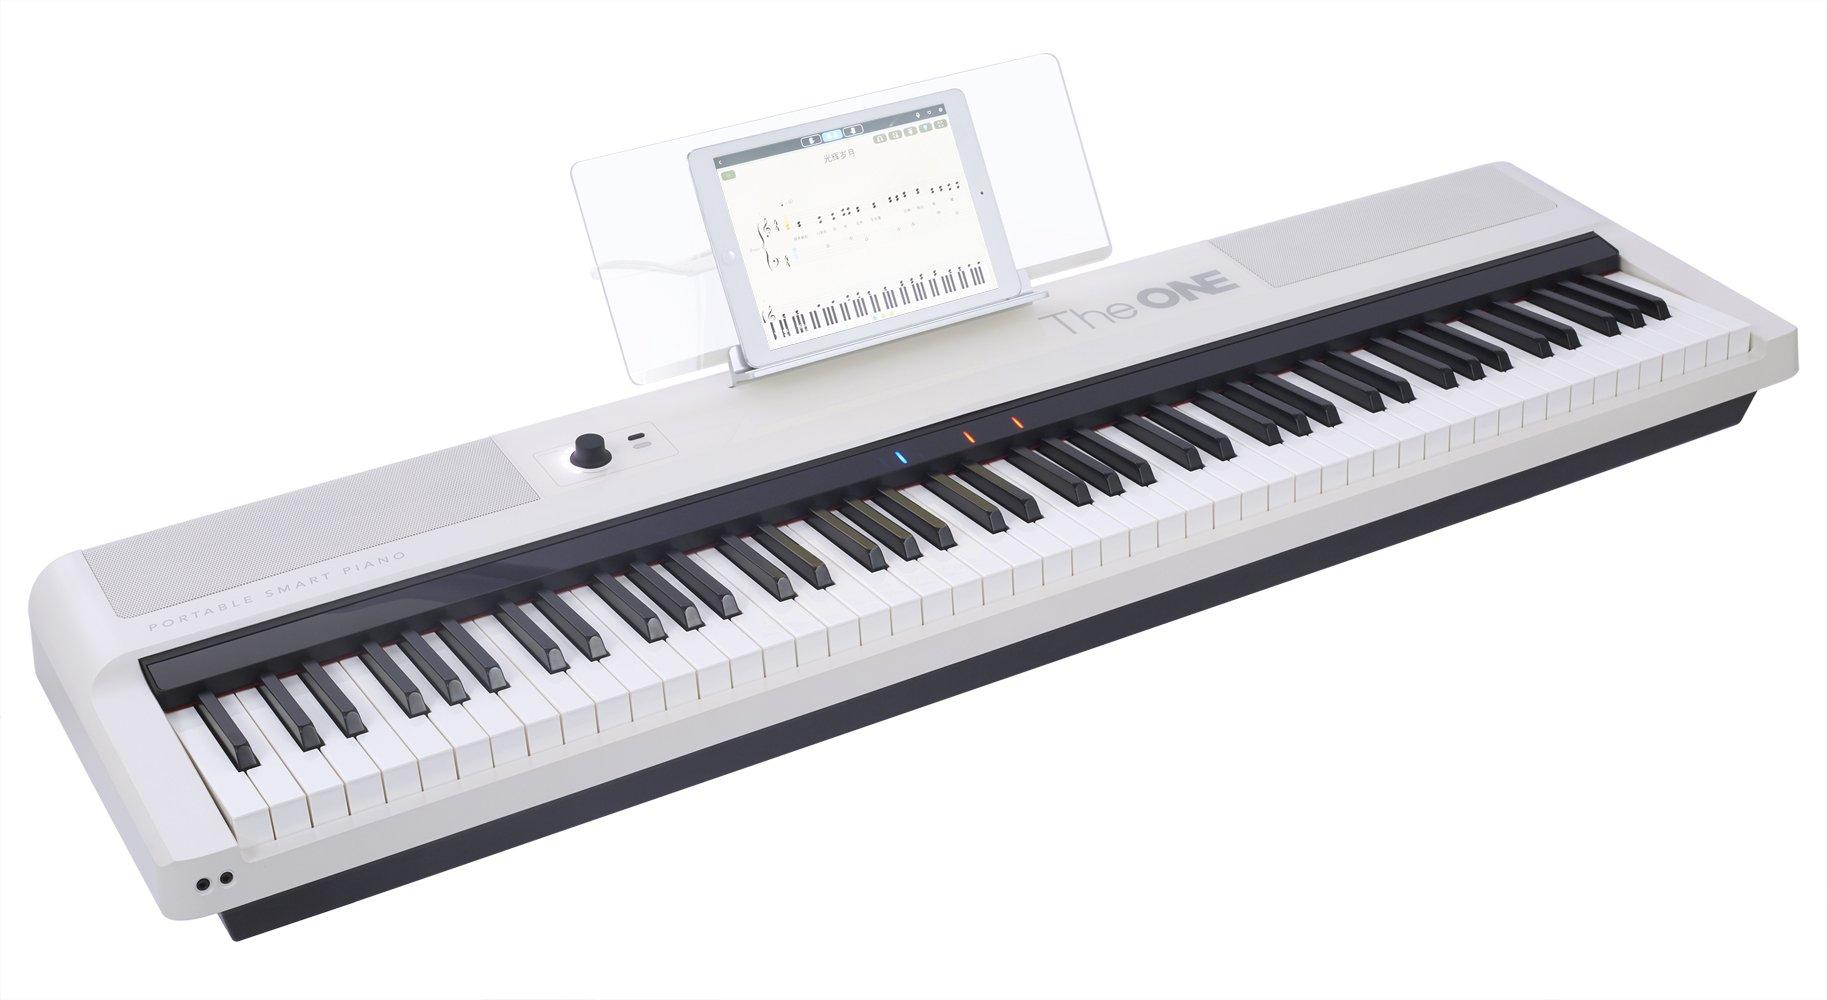 galleon the one smart keyboard pro 88 key digital piano keyboard portable digital piano. Black Bedroom Furniture Sets. Home Design Ideas